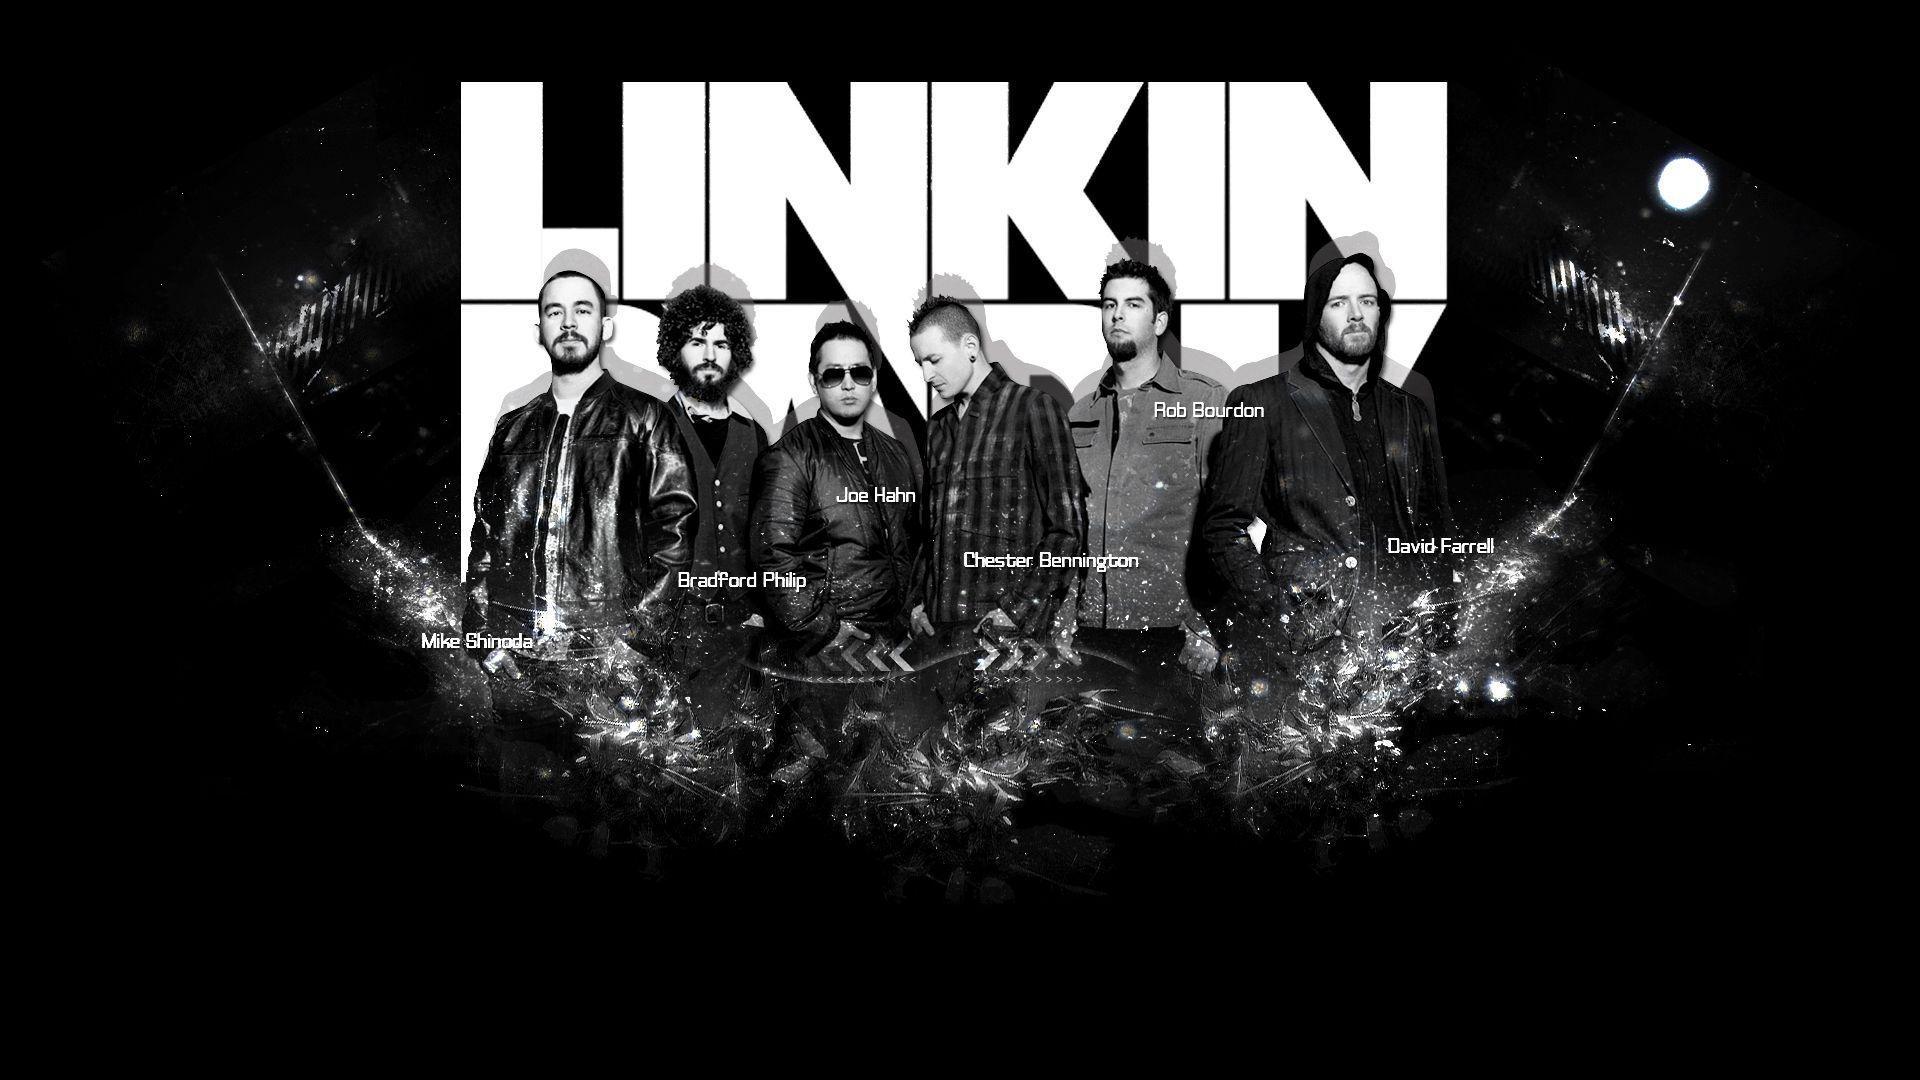 Linkin Park Wallpapers Hd 2016 Wallpaper Cave